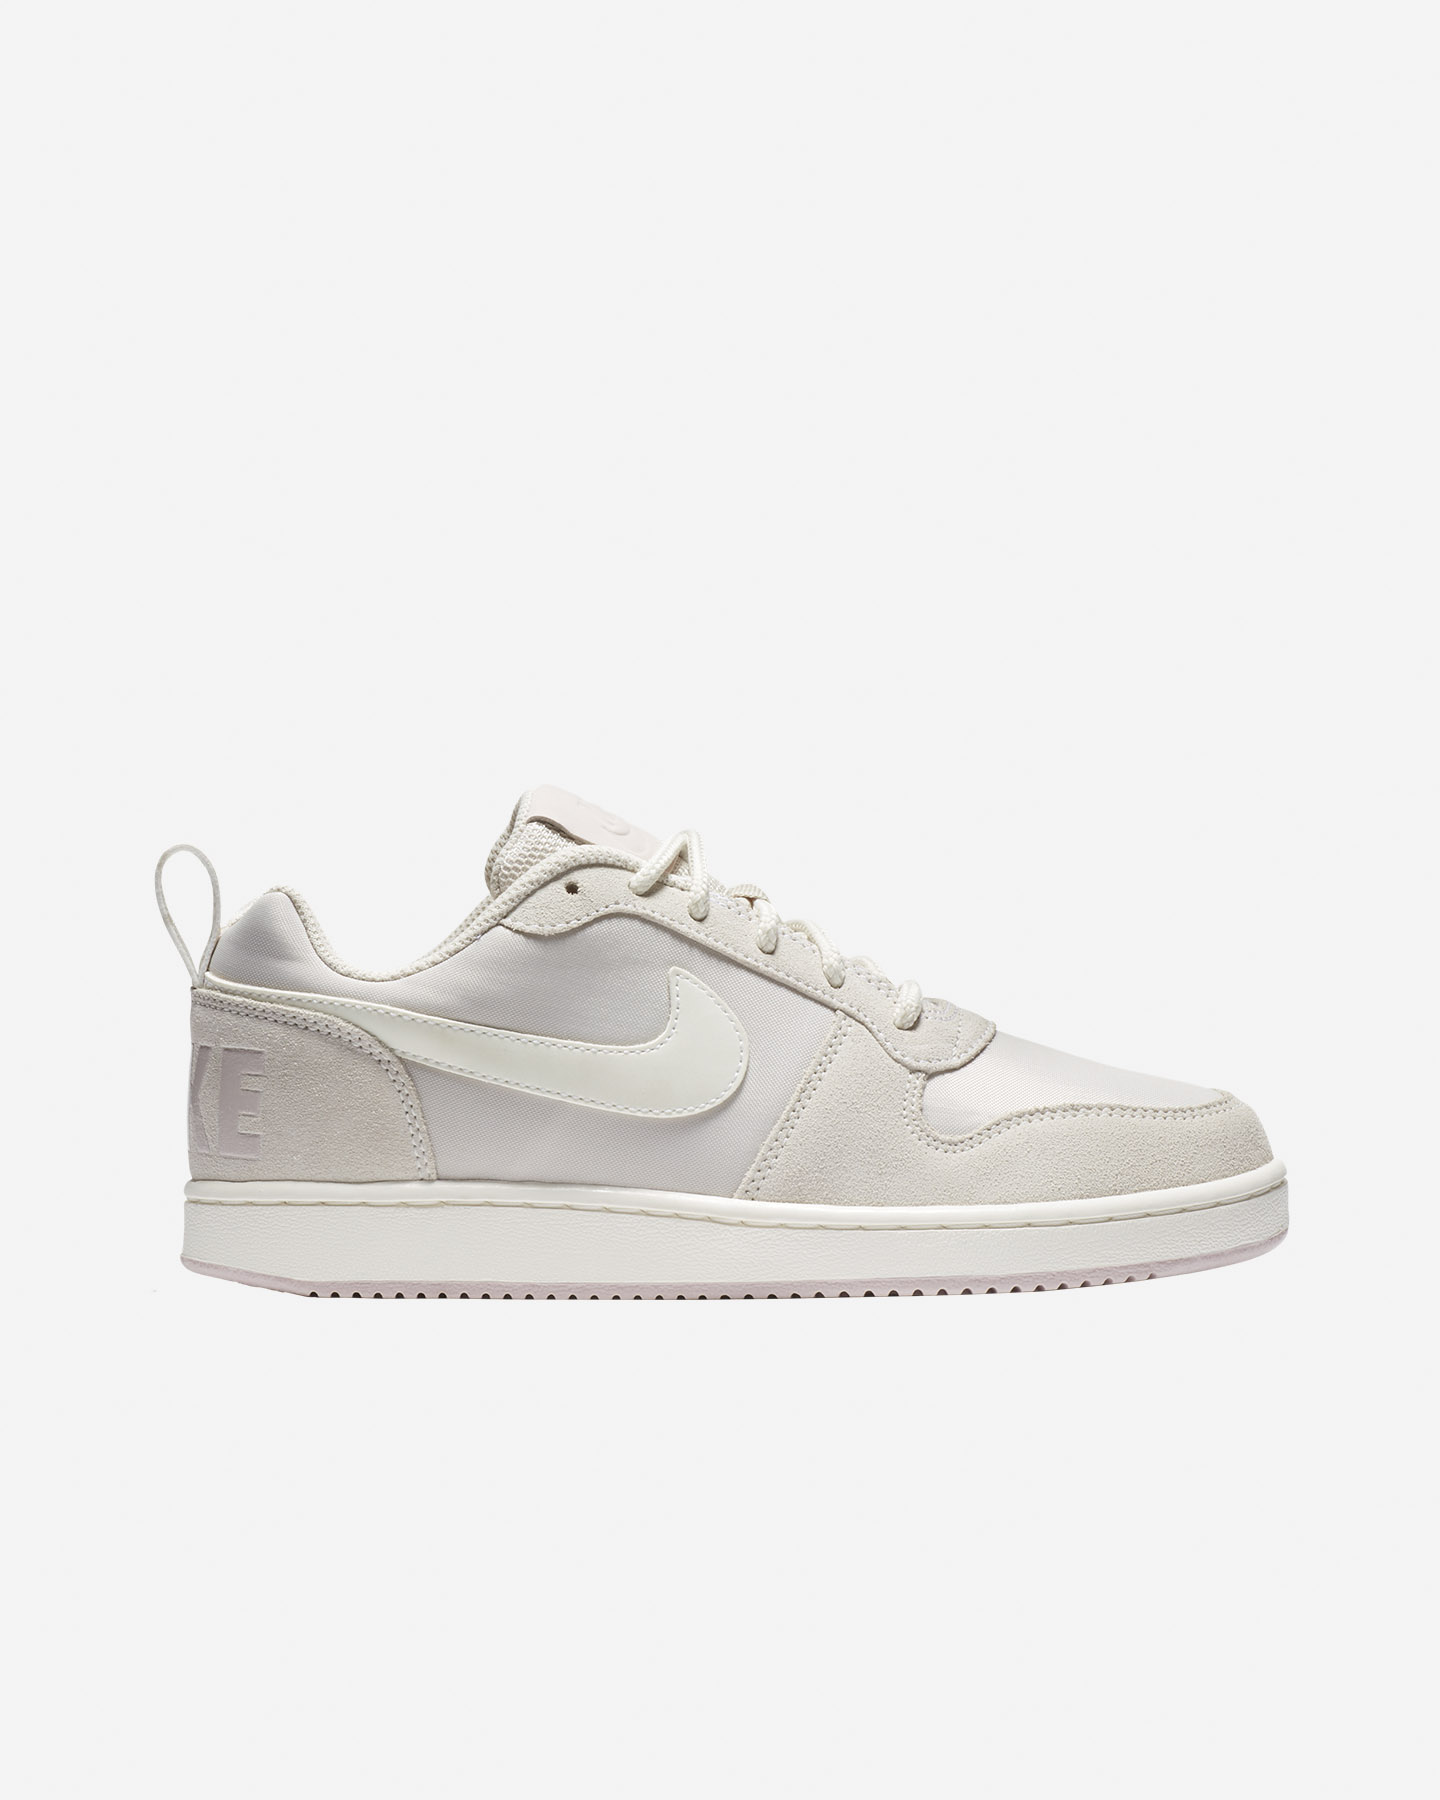 Acquista nike scarpe sneakers - OFF75% sconti 79735a502f0